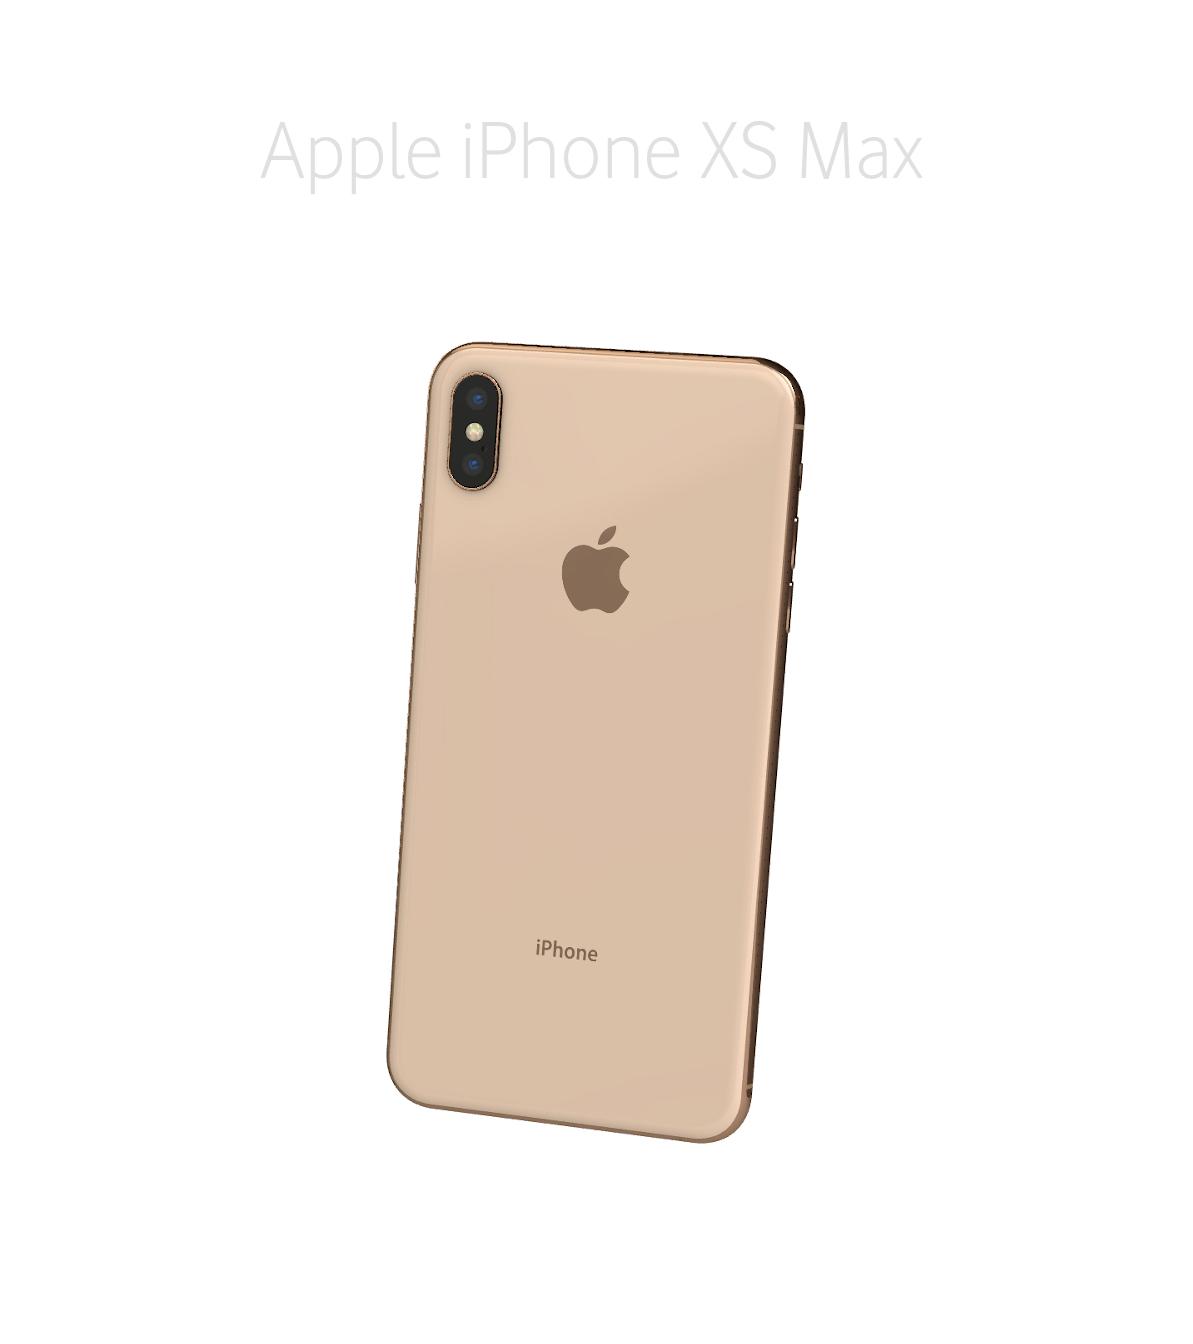 Laga glas/baksida iPhone Xs Max